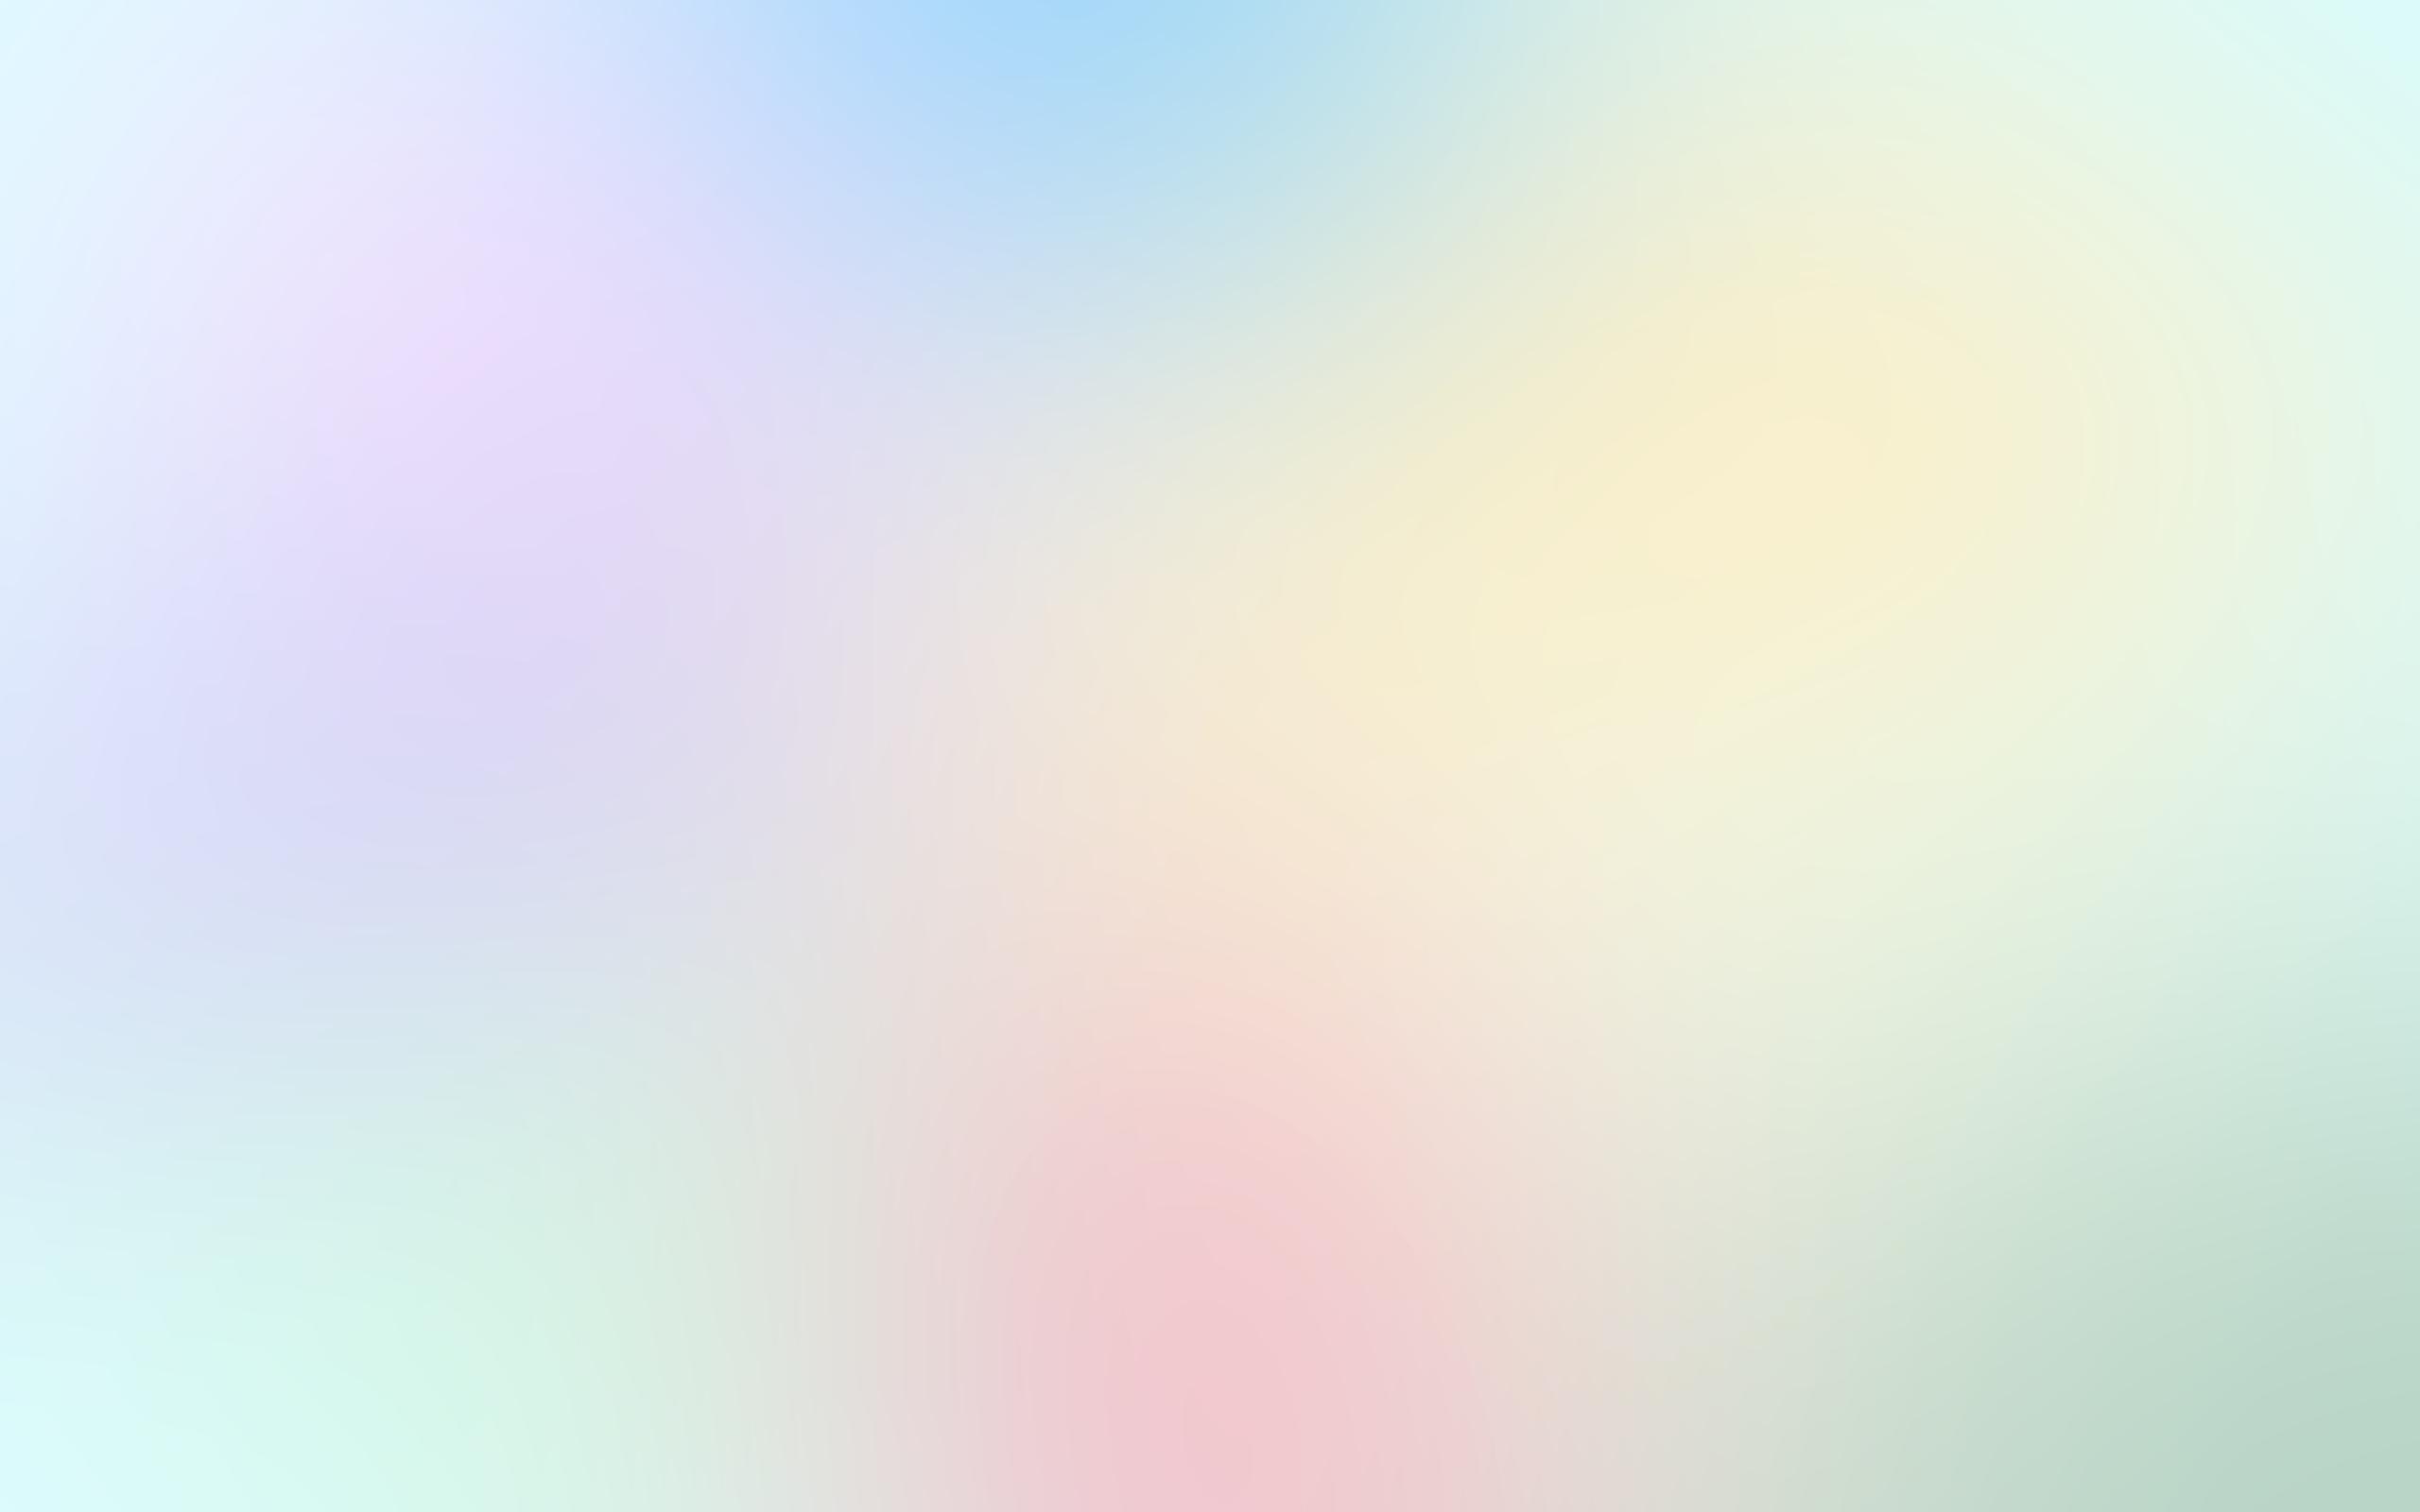 pastel colors background tumblr Scandinavian Medium | Background ...